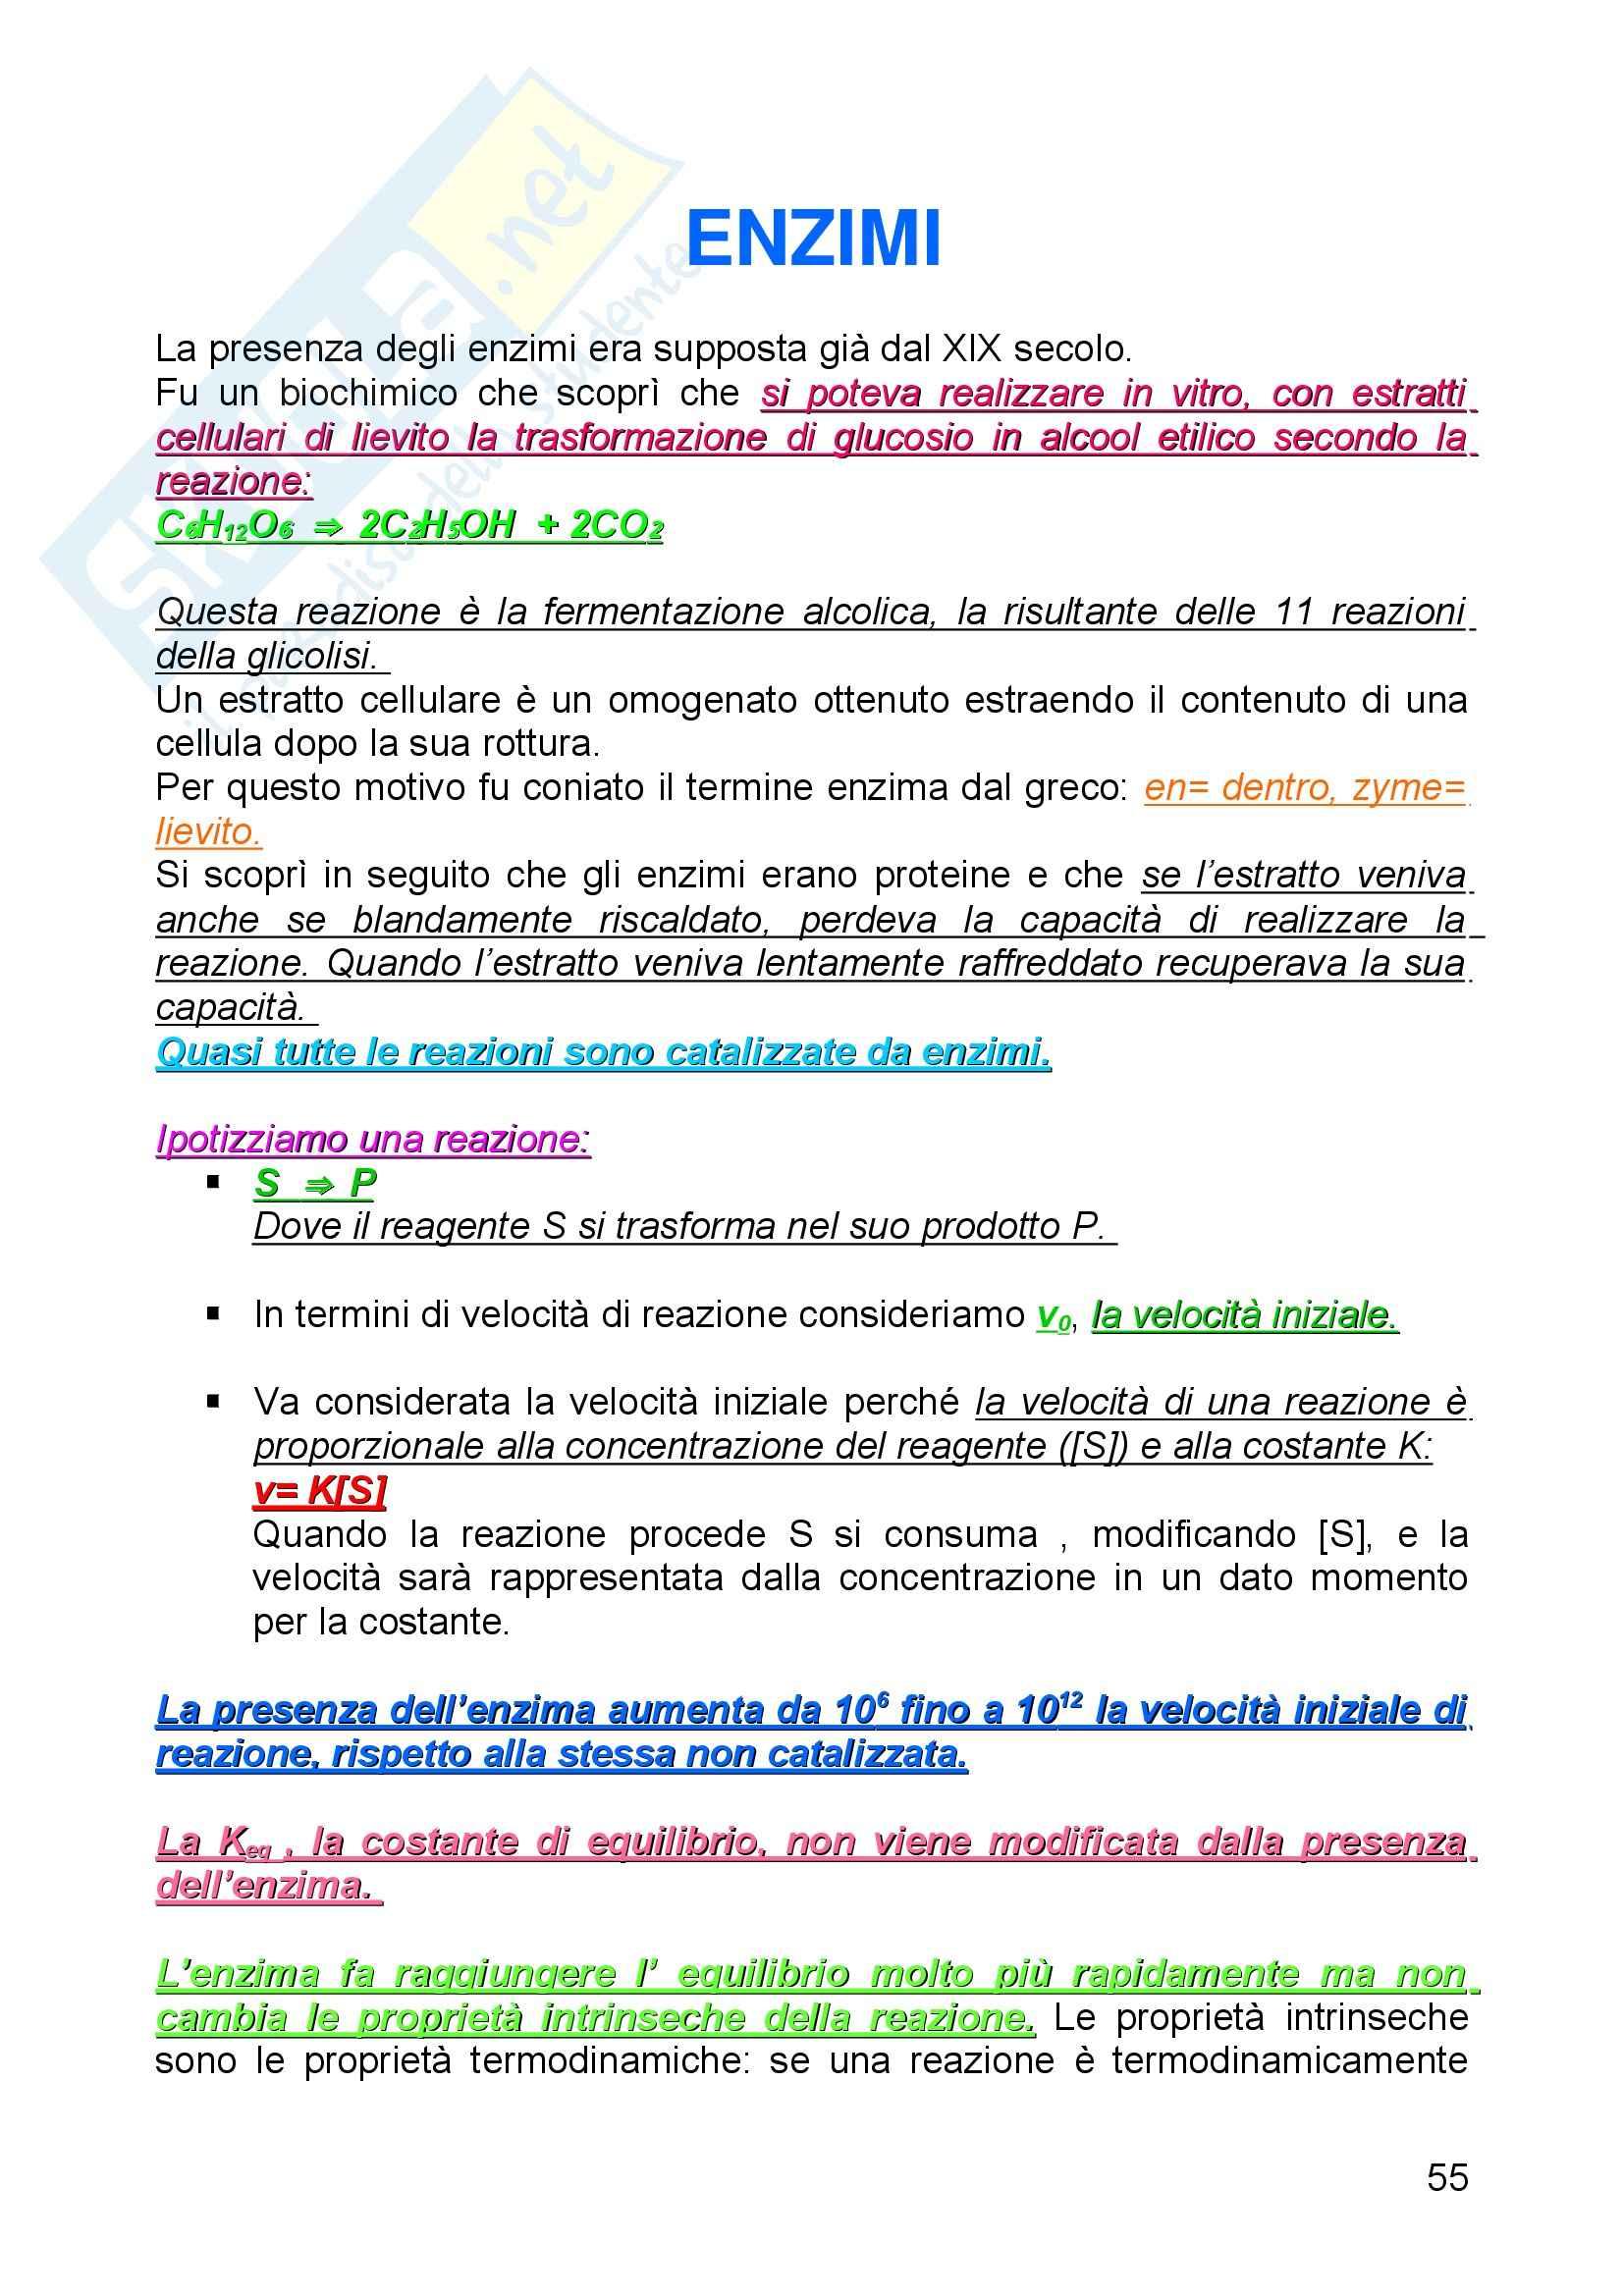 Biochimica I - Enzimi - Riassunto esame, prof. Camici